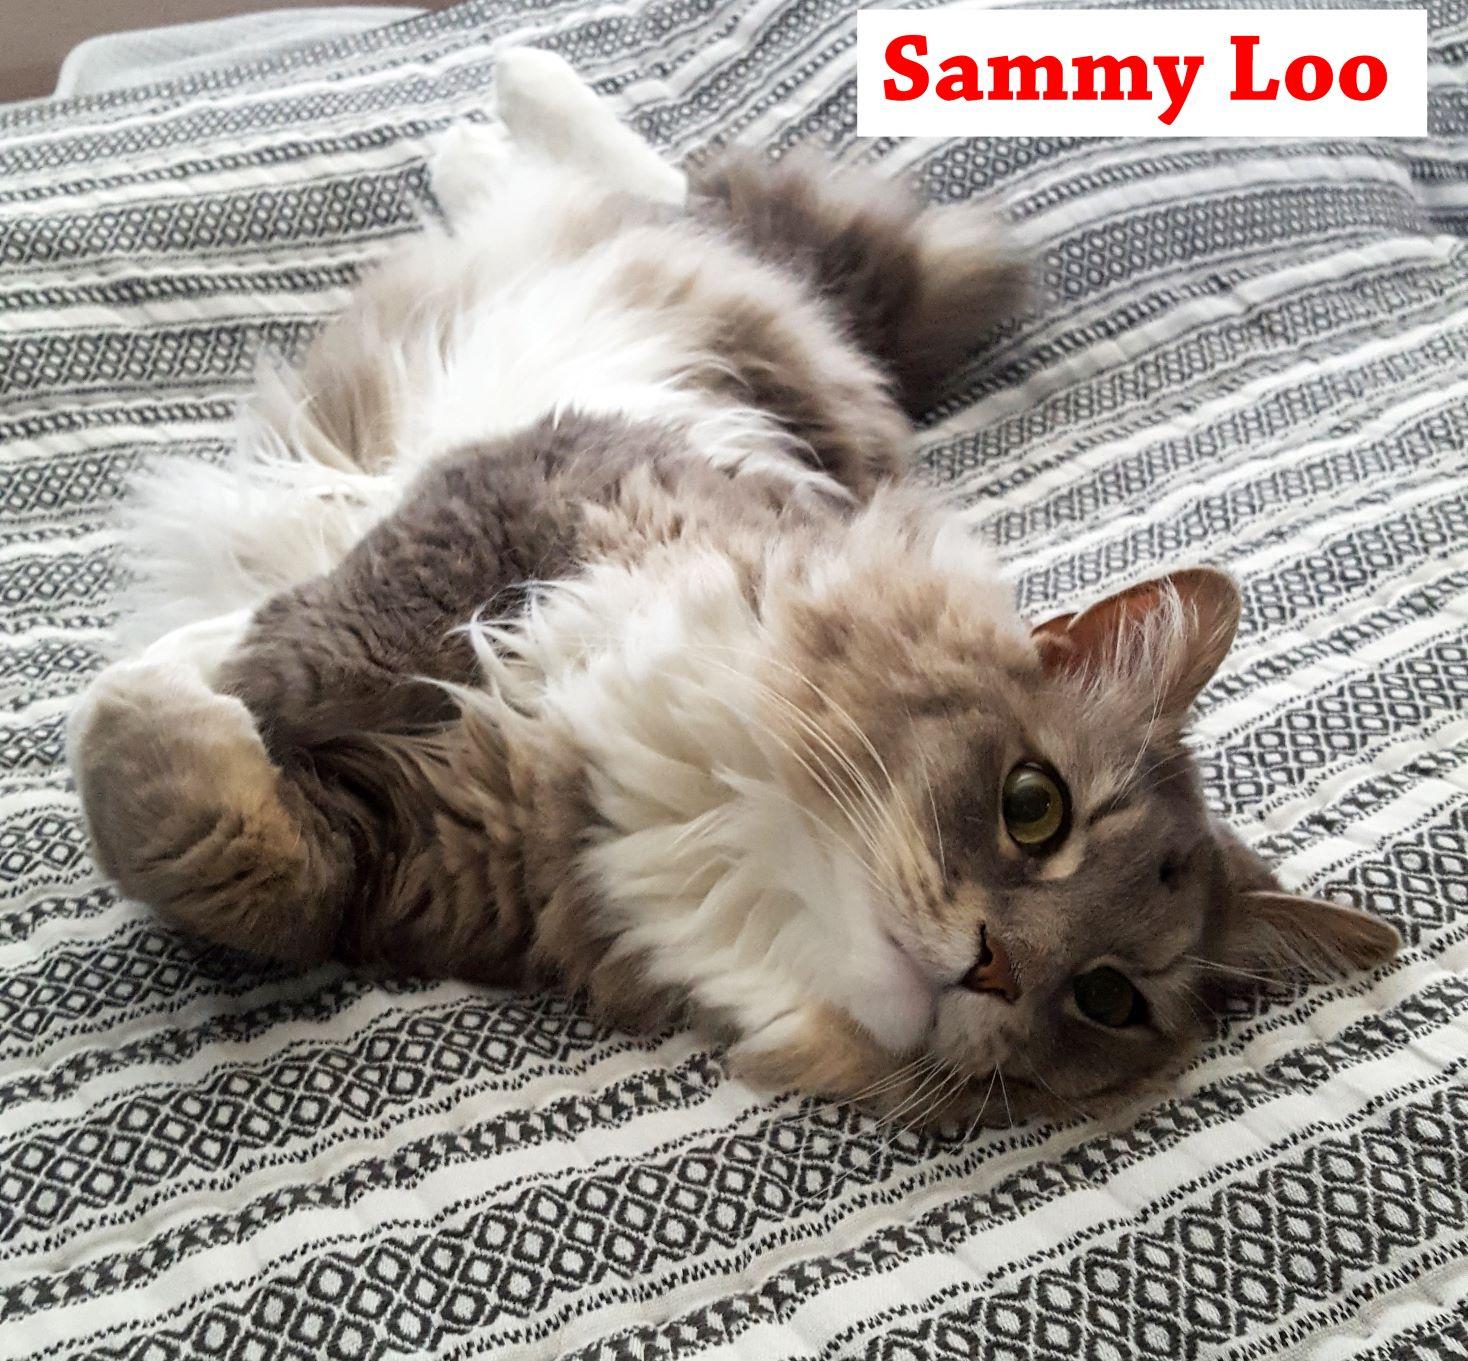 Sammy Loo Palmer